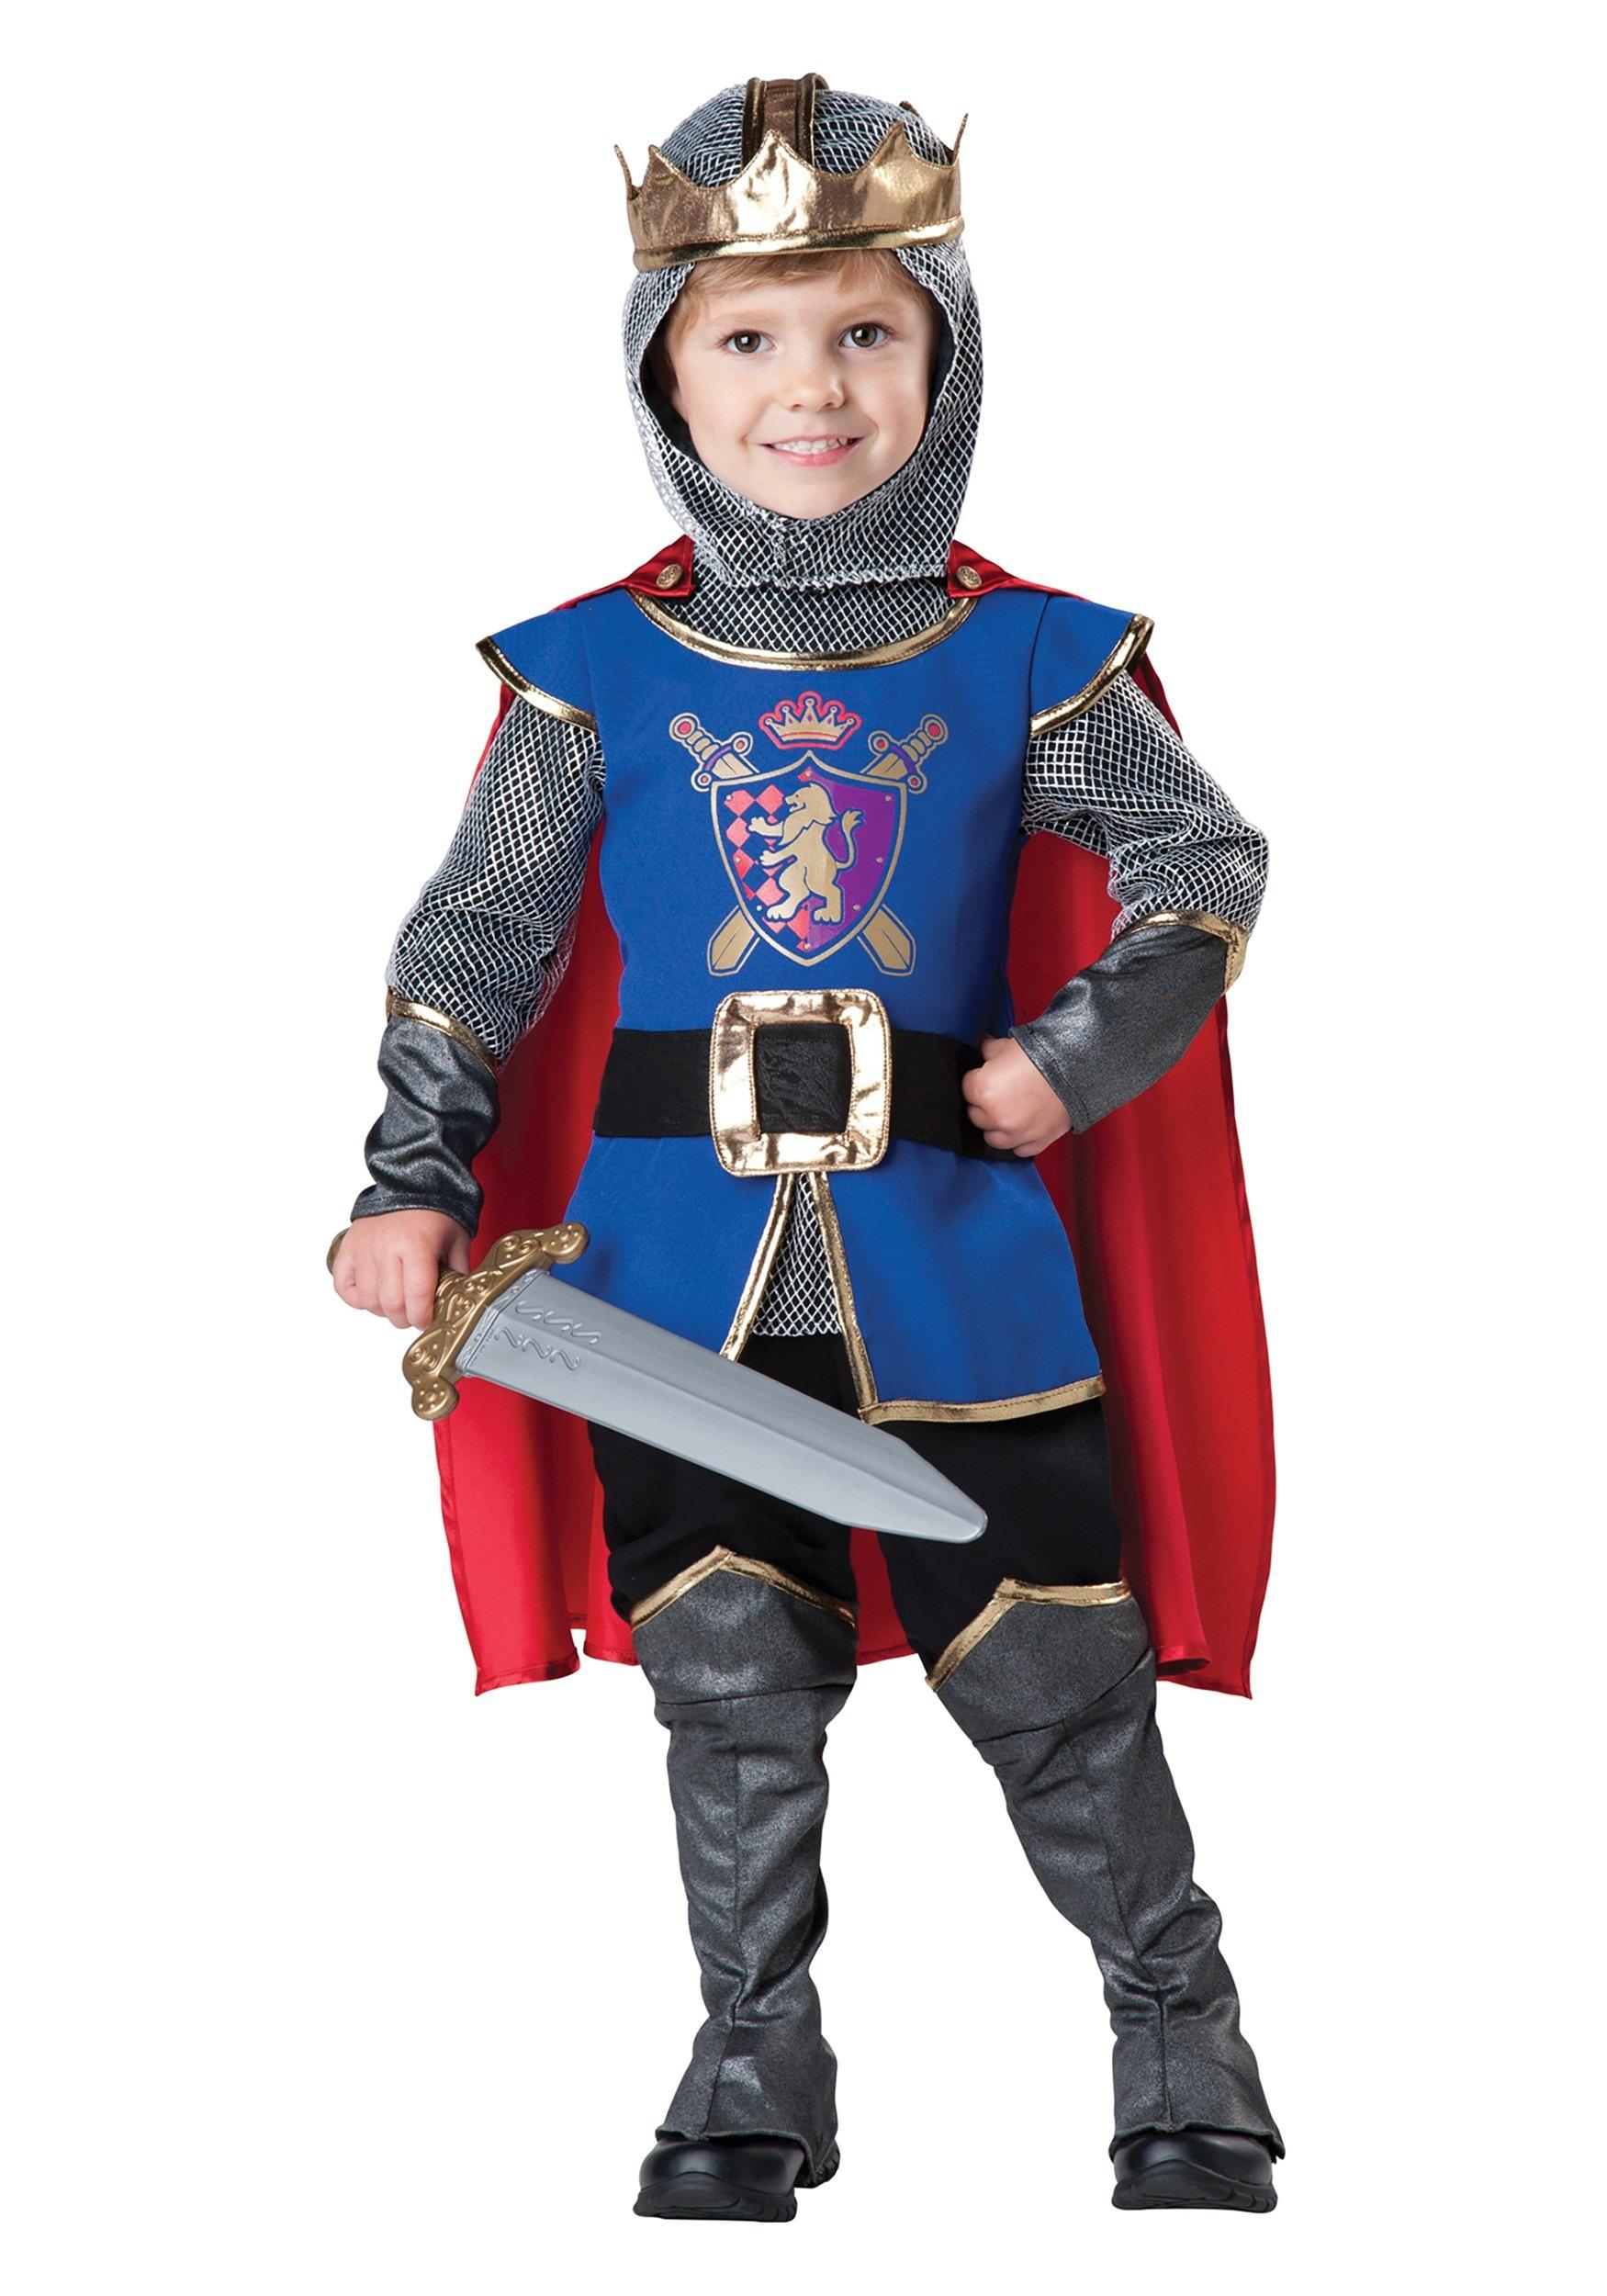 Toddler Valiant Knight Costume | Toddler Warrior Costume